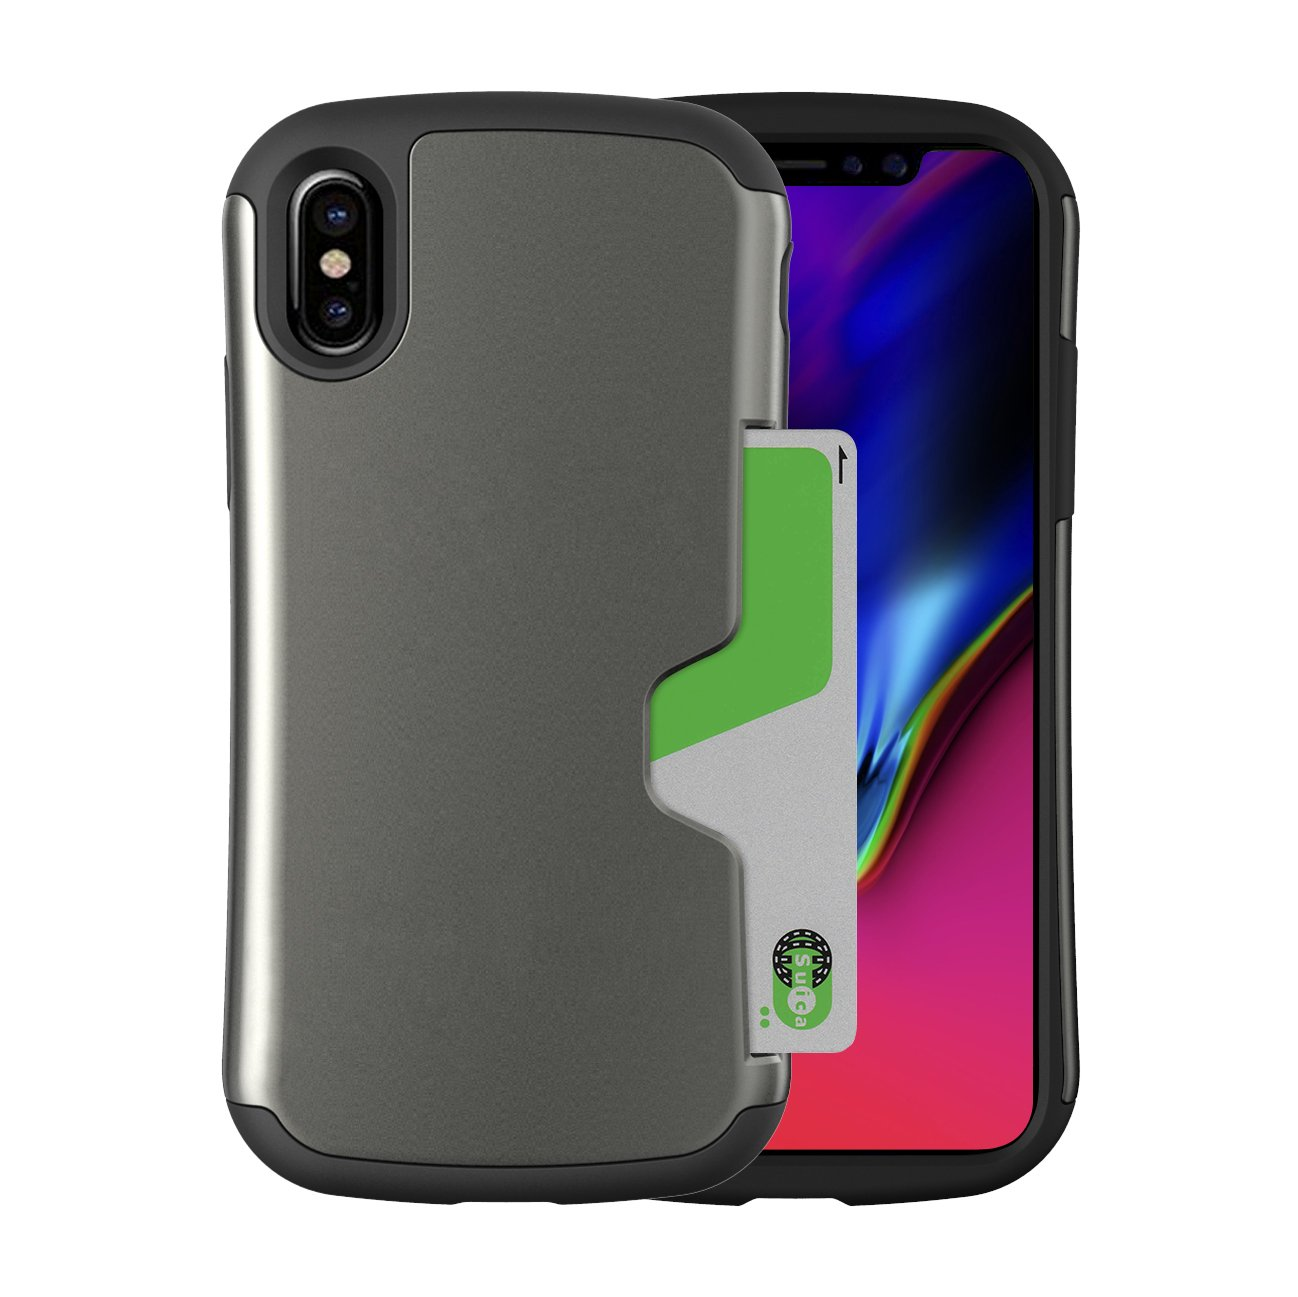 4460ef03c6 Amazon | カード収納機能付ケース Phonefoam Golf Original ピンク iPhone SE | ケース・カバー 通販